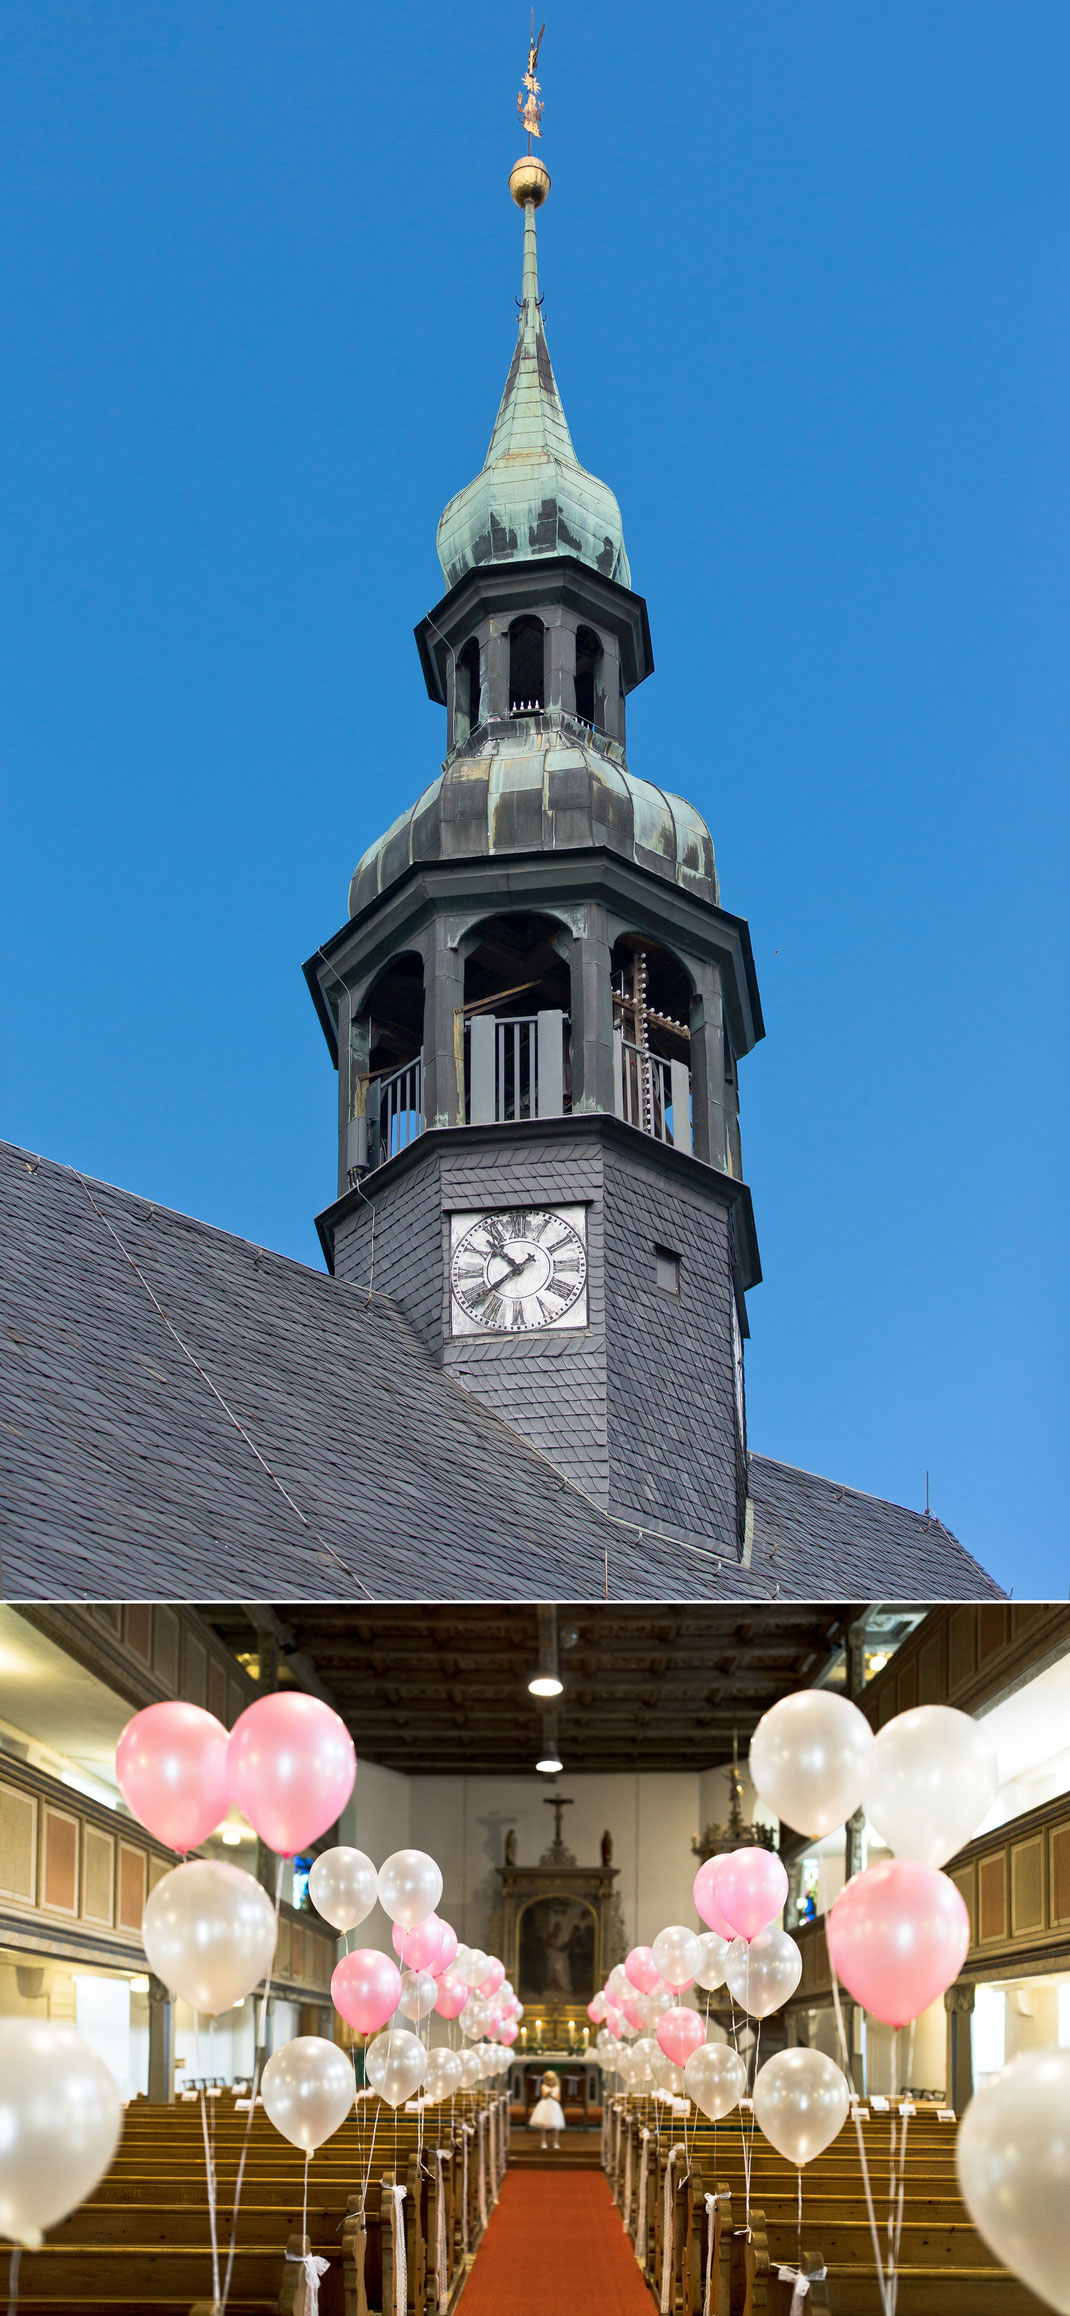 kirche neudorf, heiraten in neudorf, kirchliche trauung neudorf, hochzeitsfotograf erzgebirge, neudorf kirche